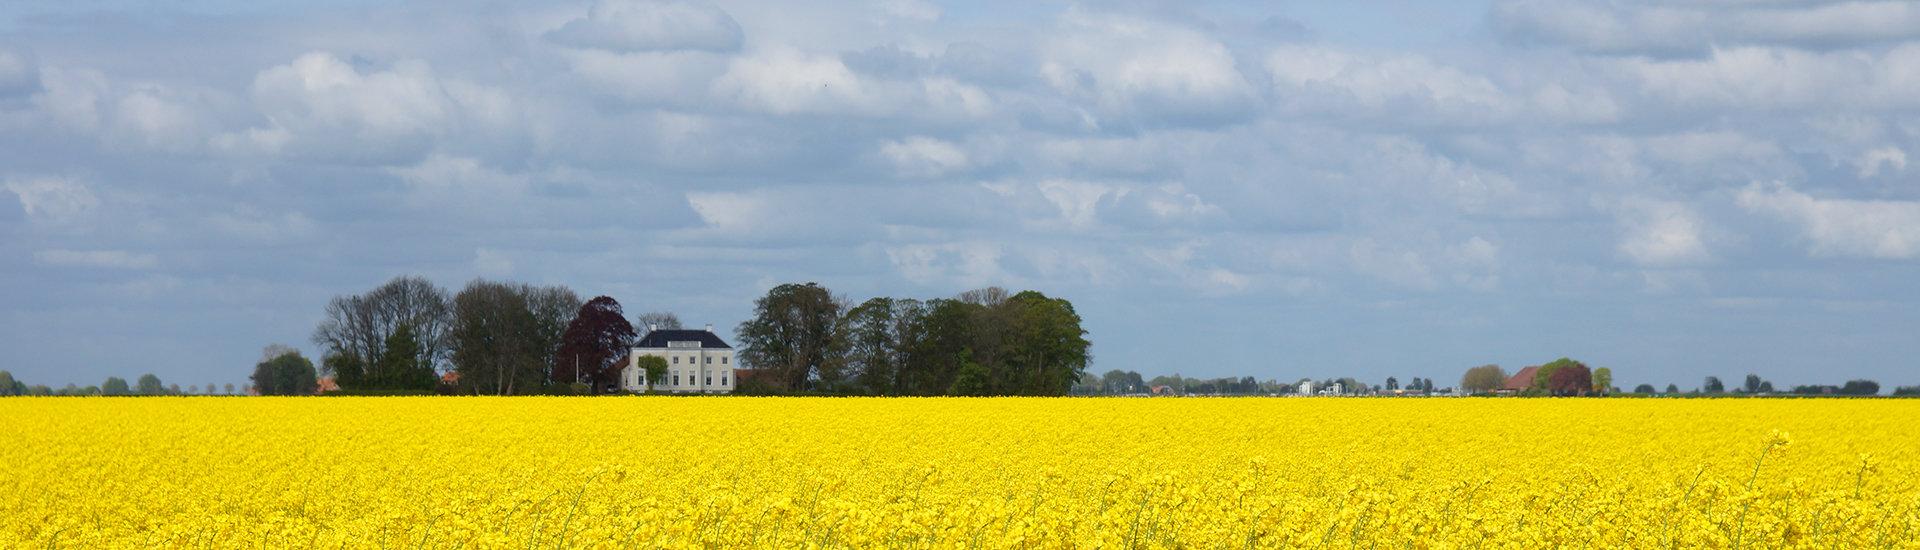 Koolzaadveld met boerderij